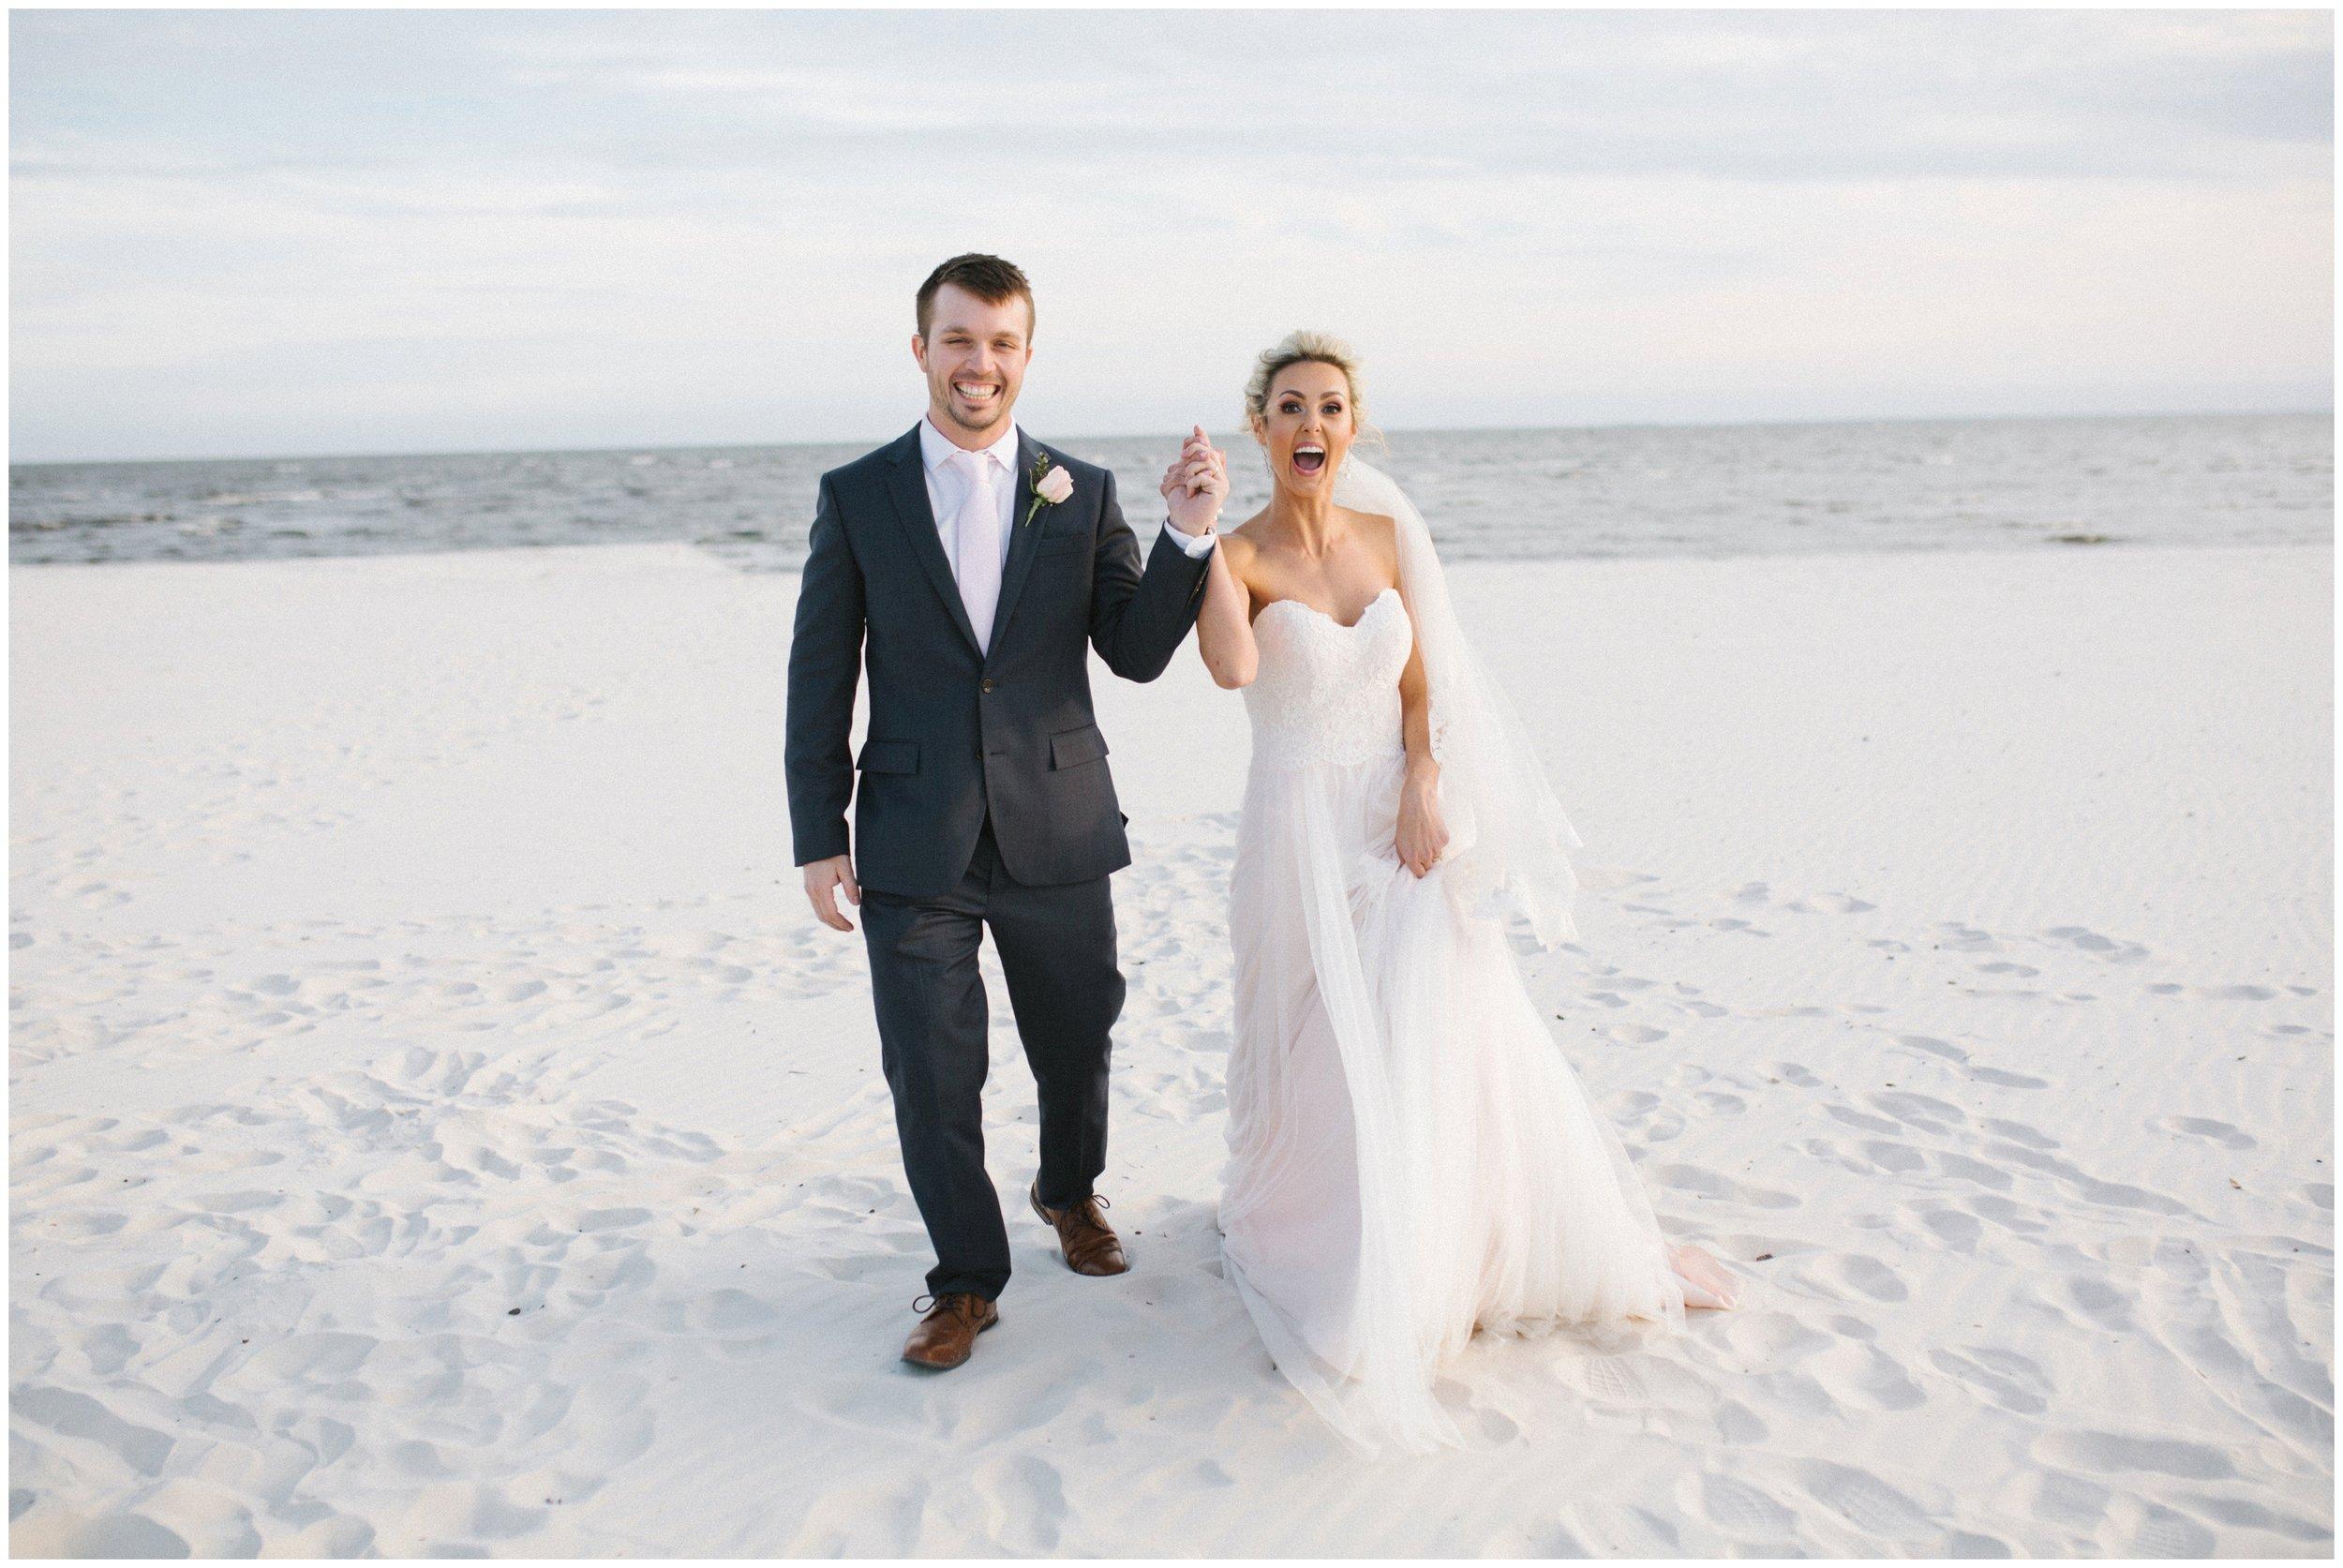 Gulf_Coast_Wedding_Photographer_0053.jpg